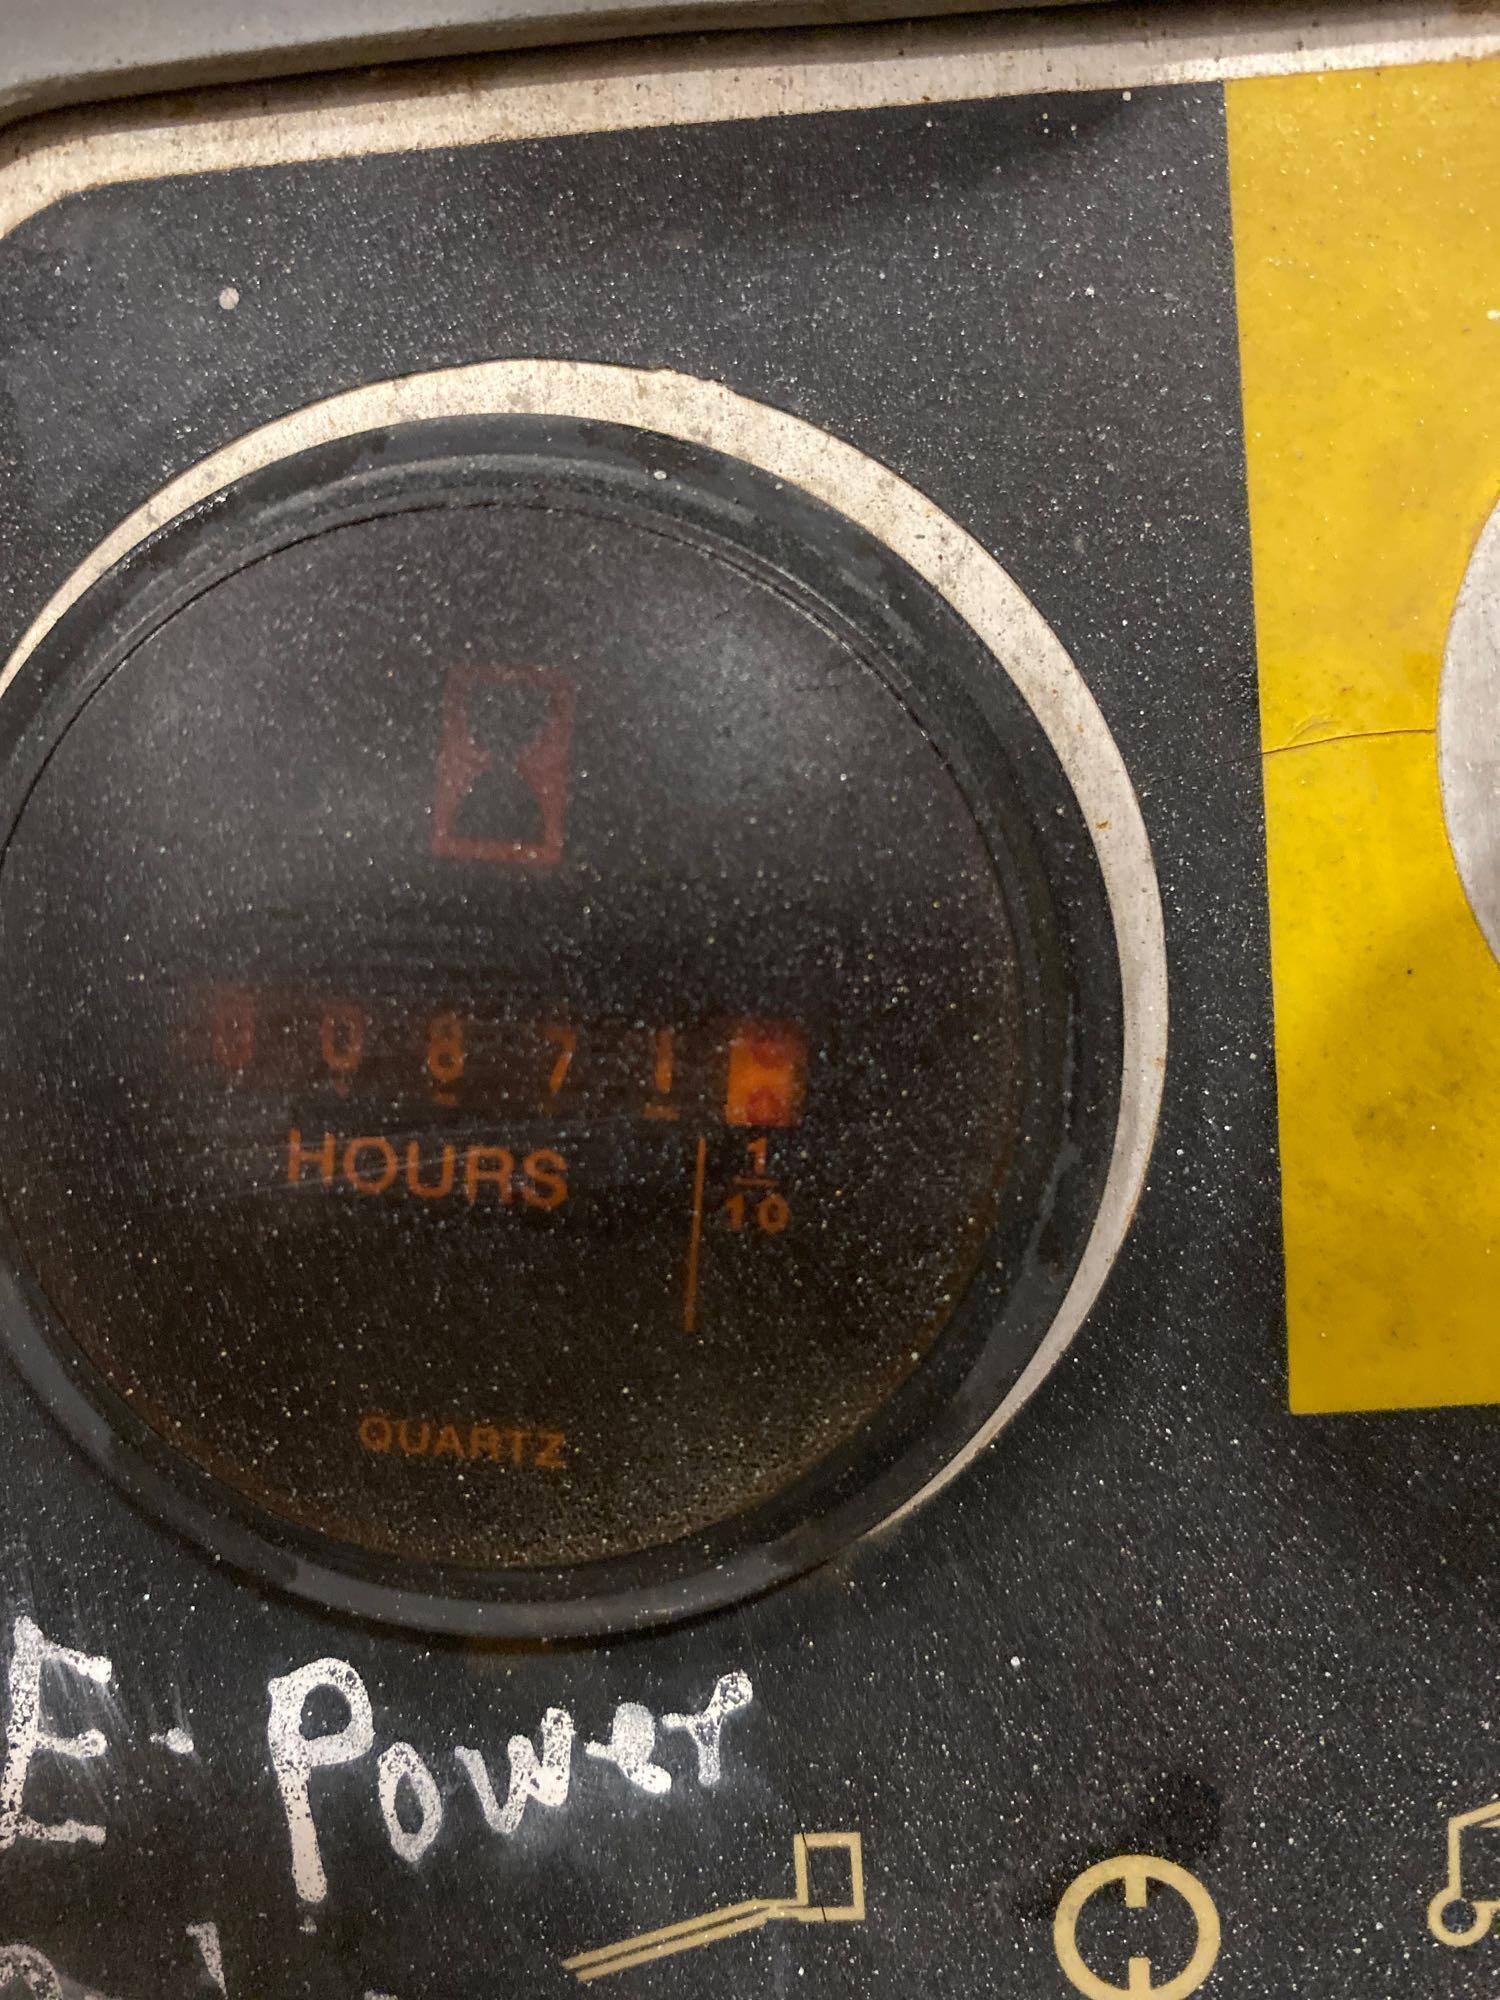 Lot 69 - GENIE Z-34/22N ARTICULATING ELECTRIC BOOM LIFT, NON MARKING TIRES, 34' PLATFORM HEIGHT, BUILT IN BAT